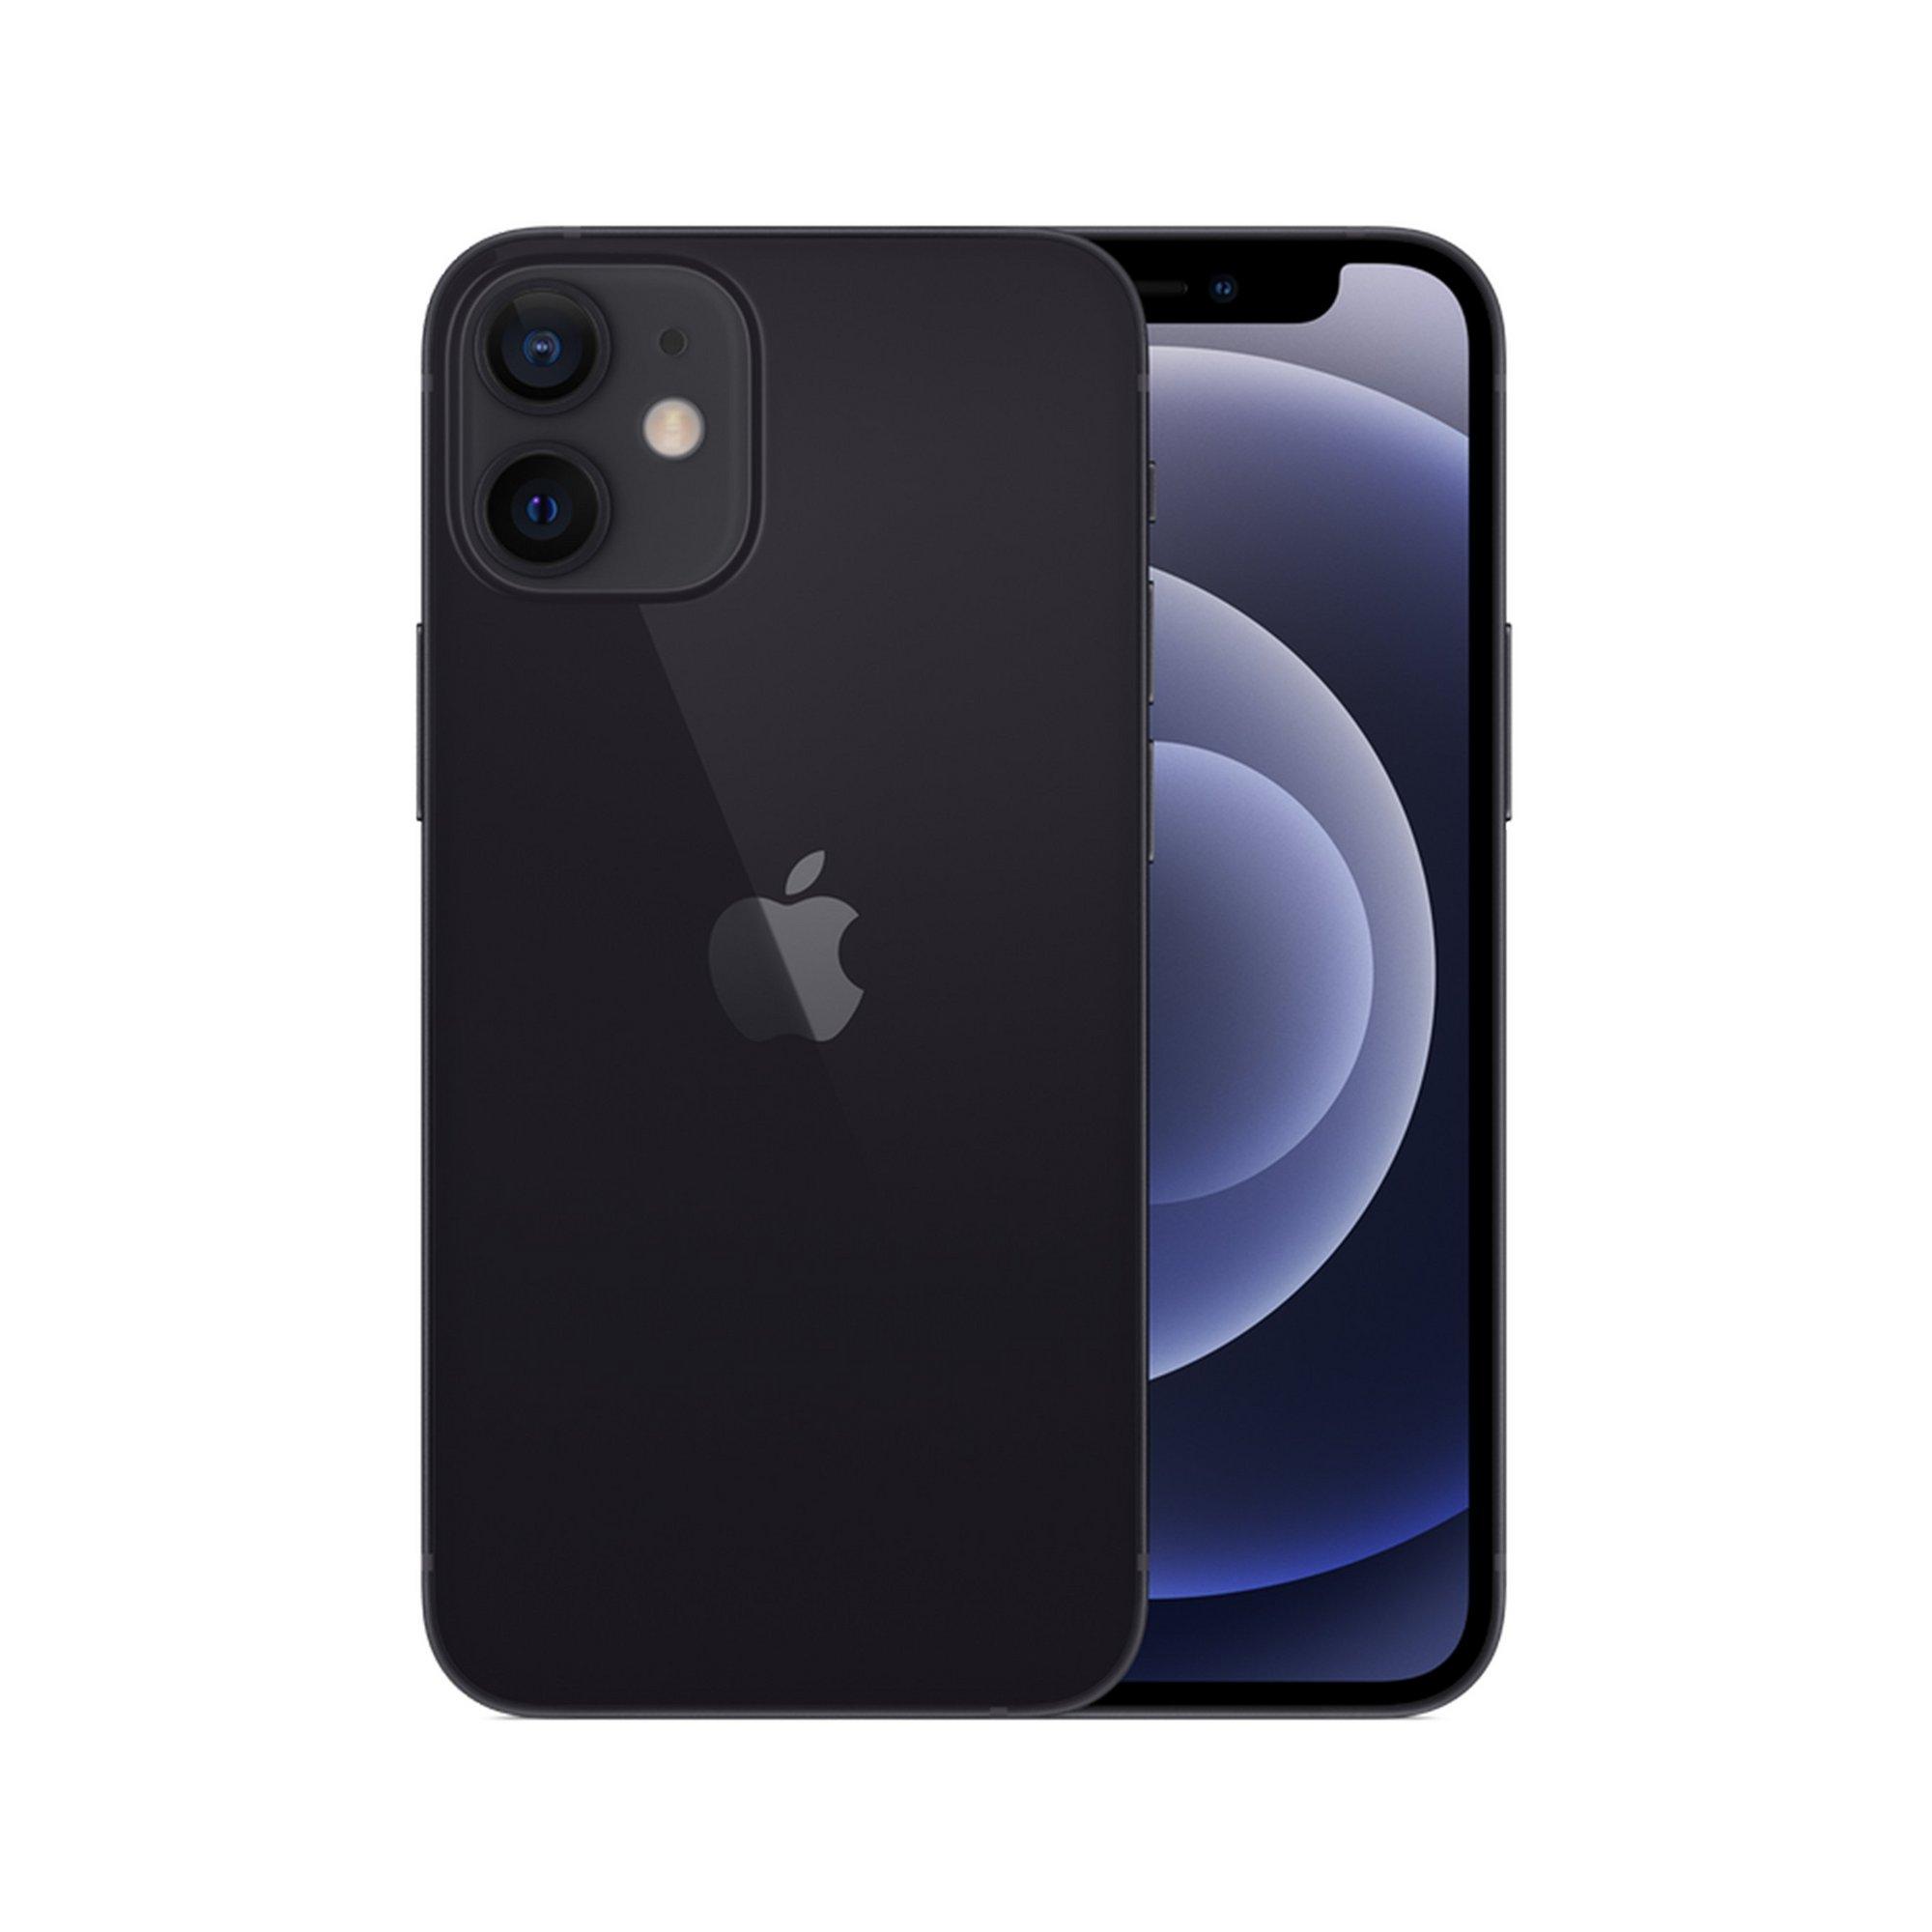 Image of iPhone 12 256GB